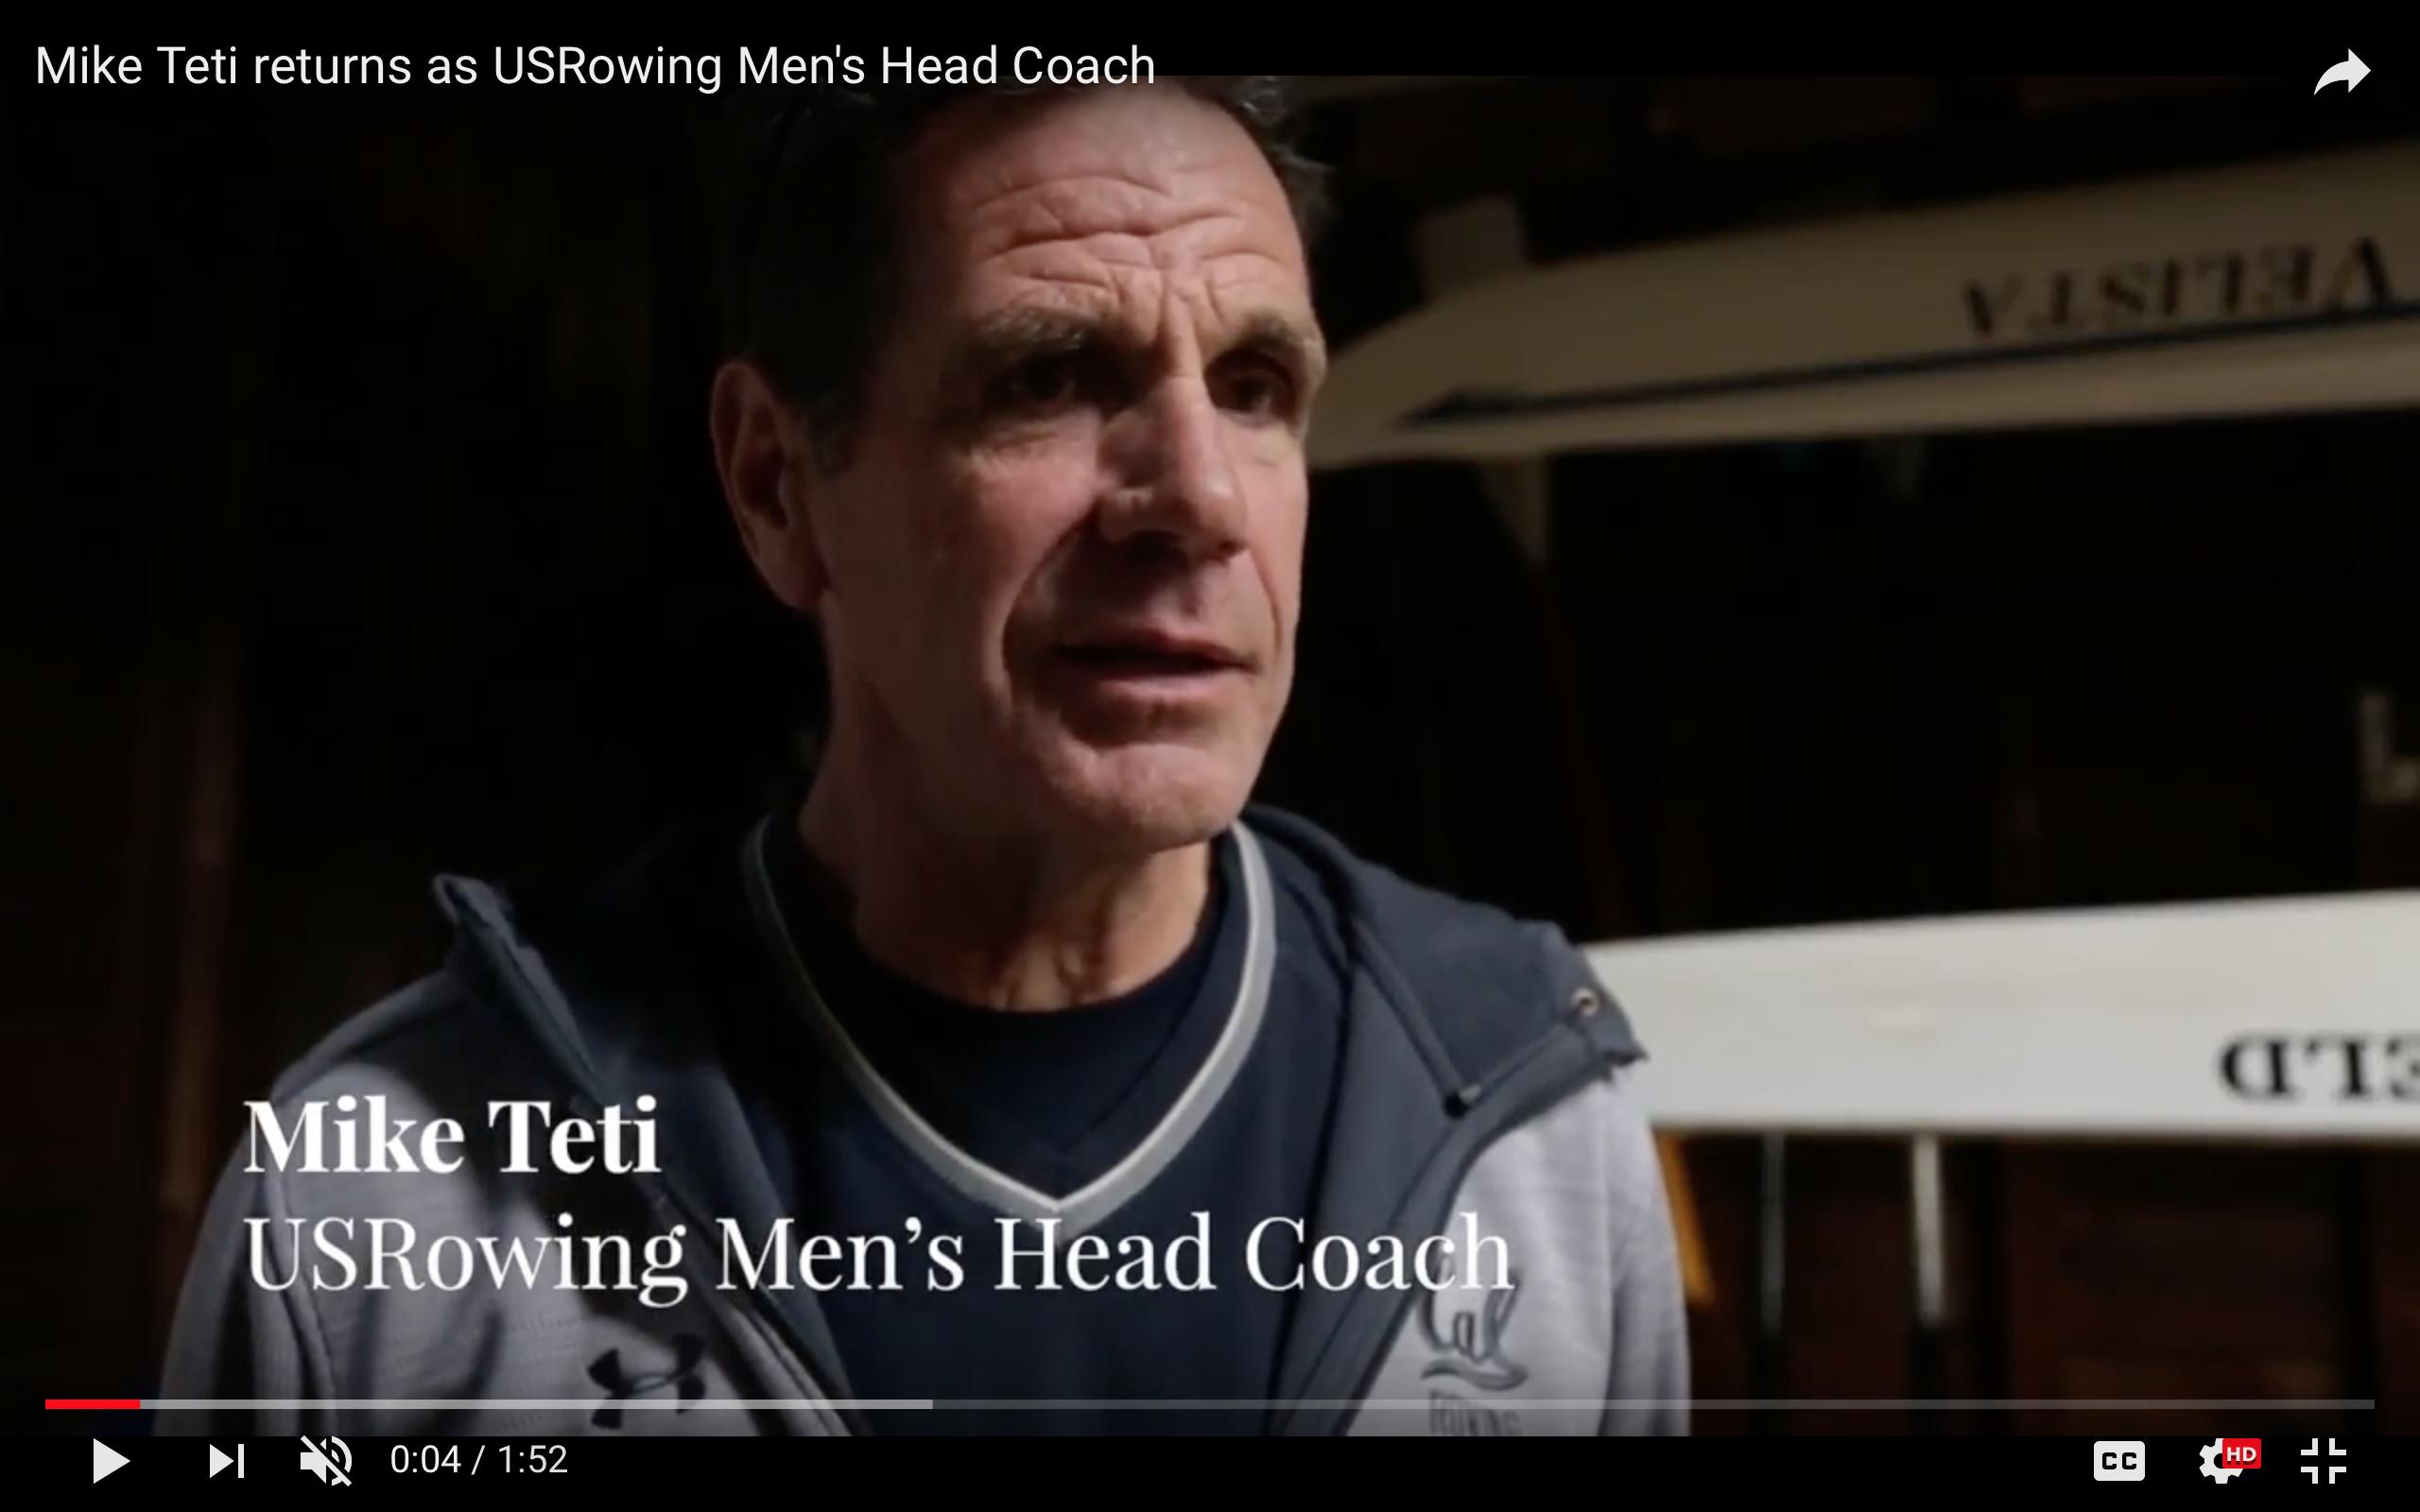 Teti Back at the Helm of U.S. Men's Team